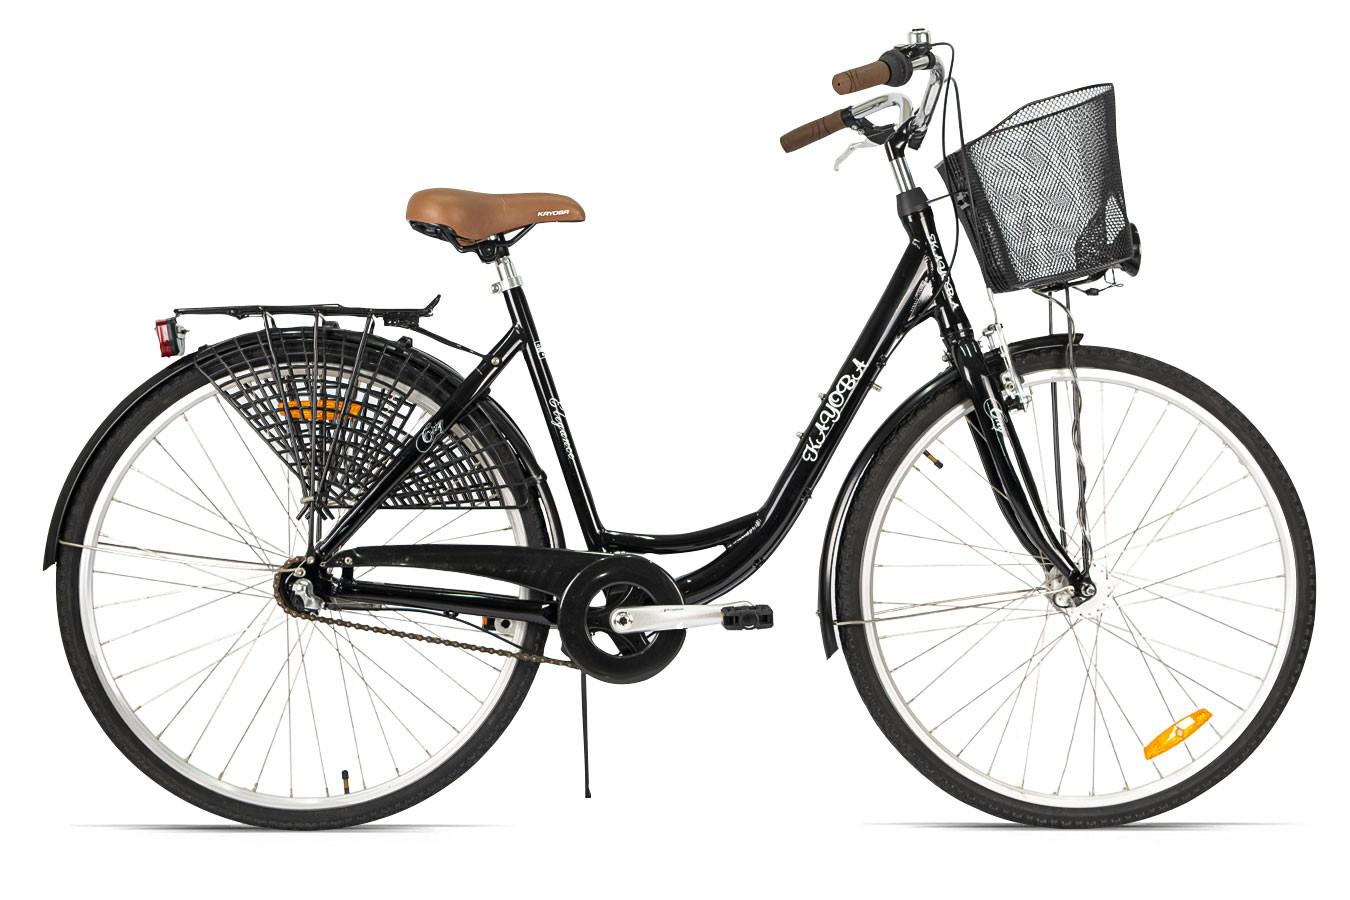 Bicicleta 28 City Ellegance - Kayoba